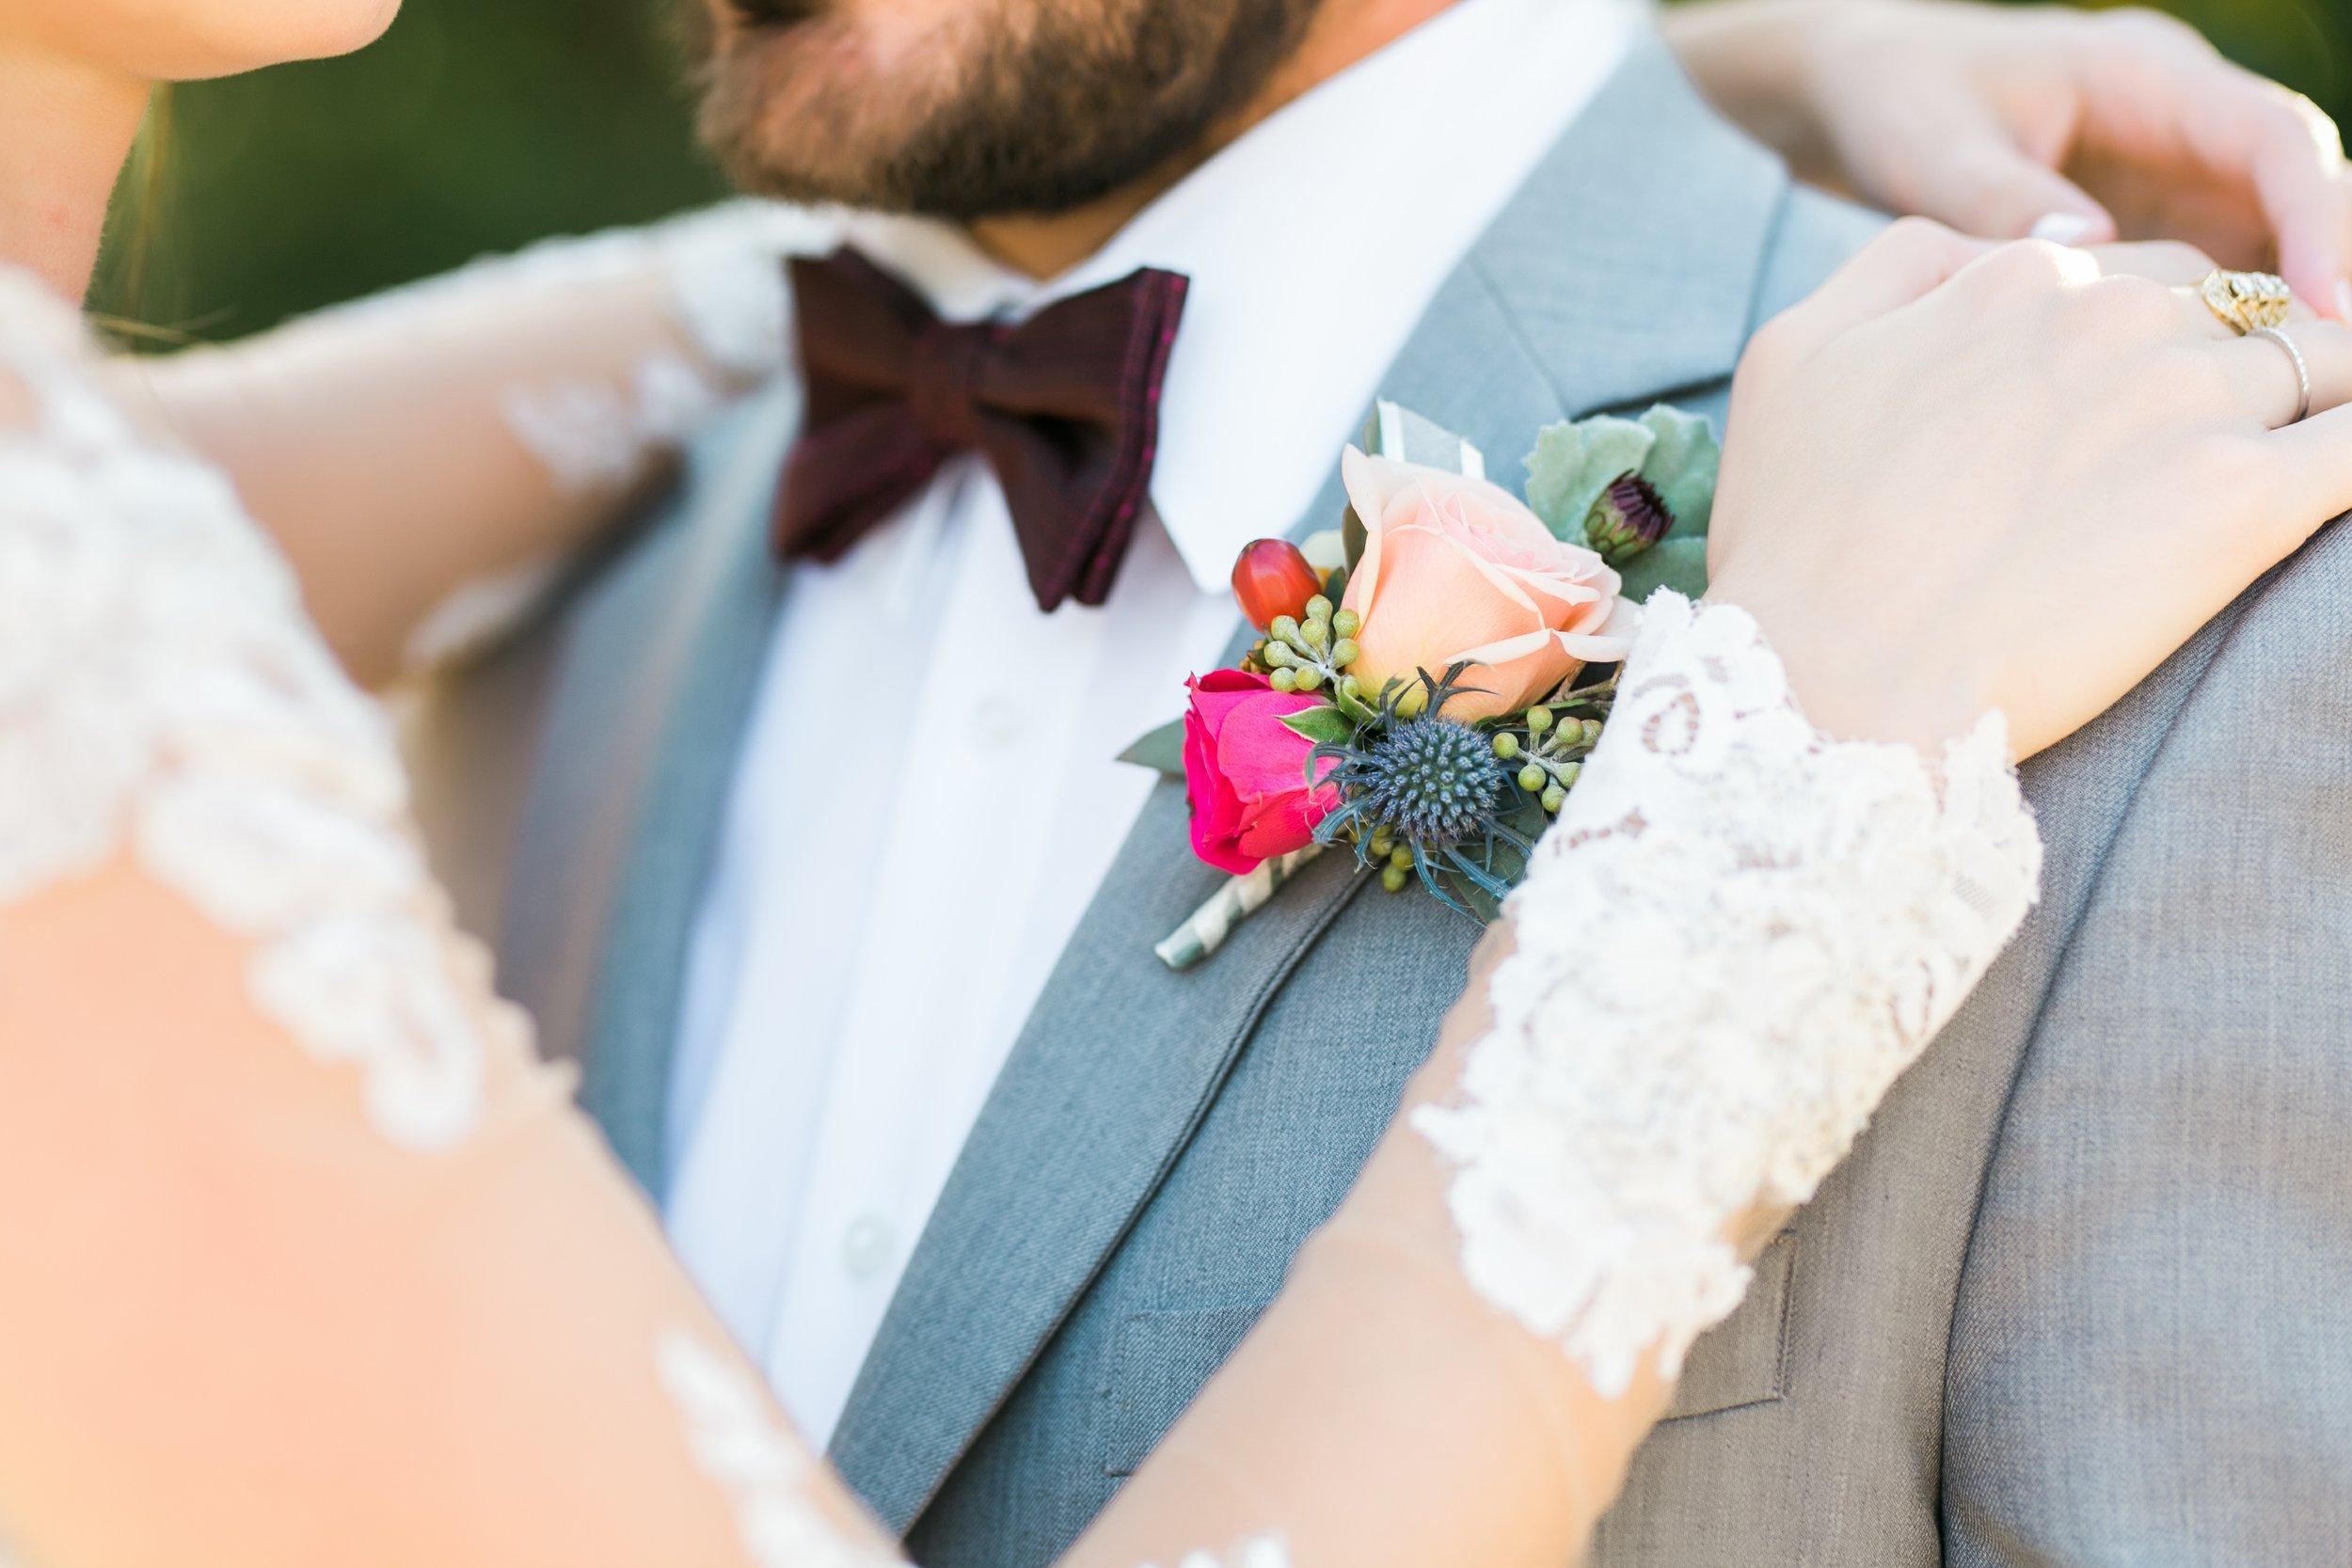 Roberson-Wedding-The-Forum-Lauren-Pinson-Wedding-Photography-Wichita-Falls-Texas-044.jpg